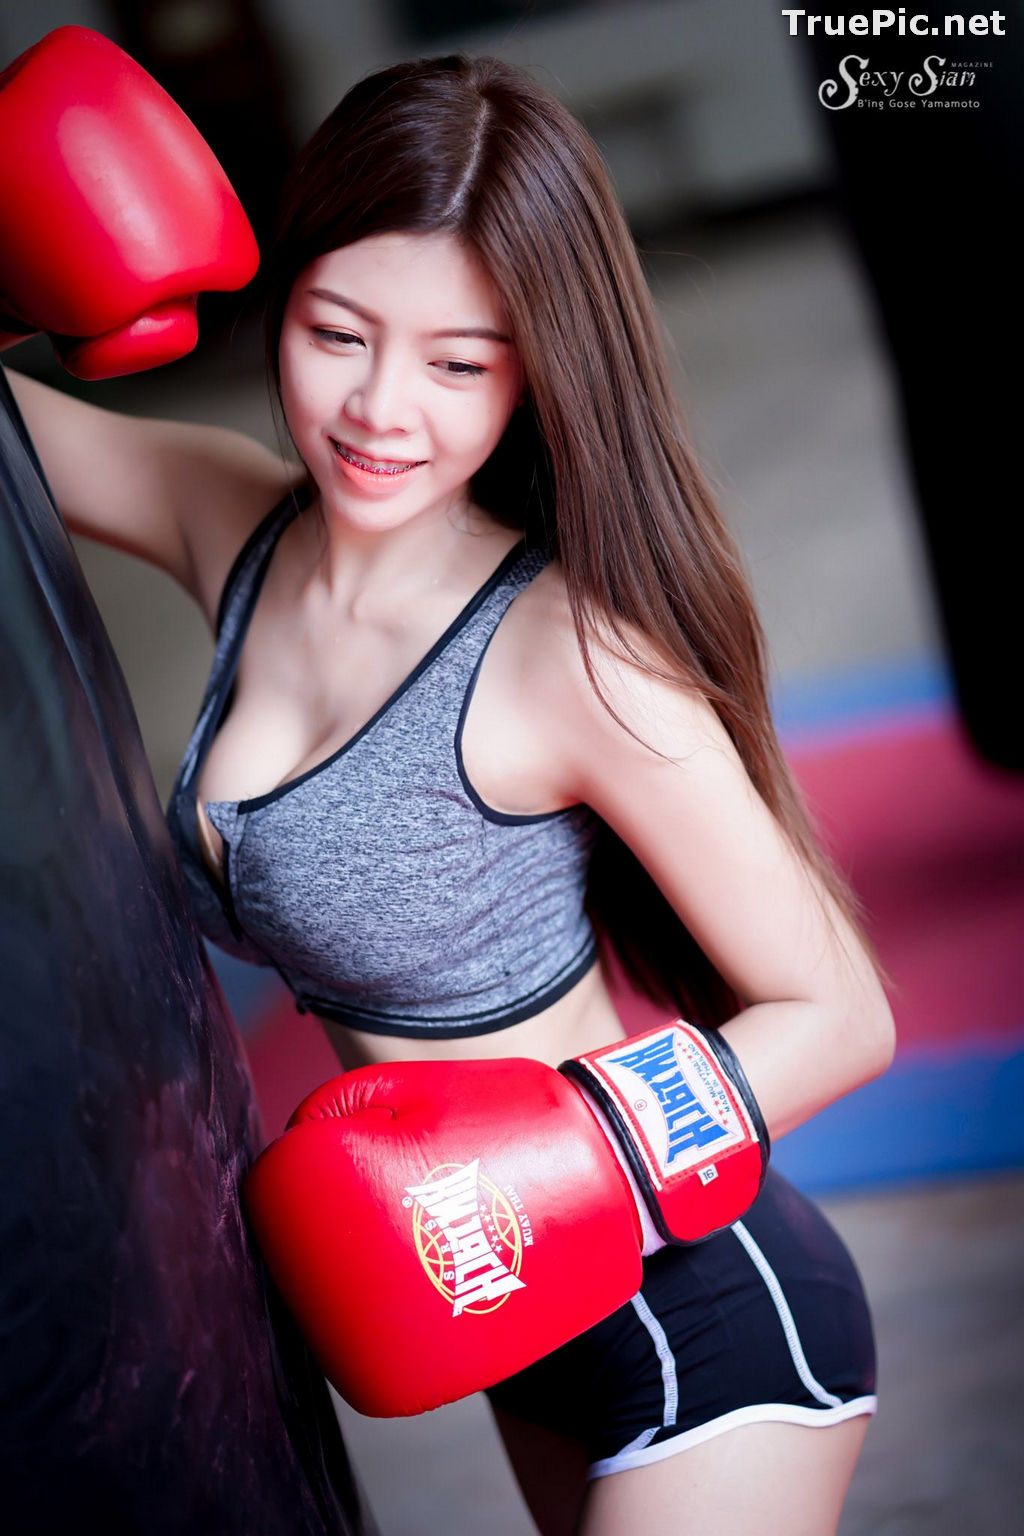 Image Thailand Model - Yotaka Suriya - Sexy Boxing Girl - TruePic.net - Picture-10